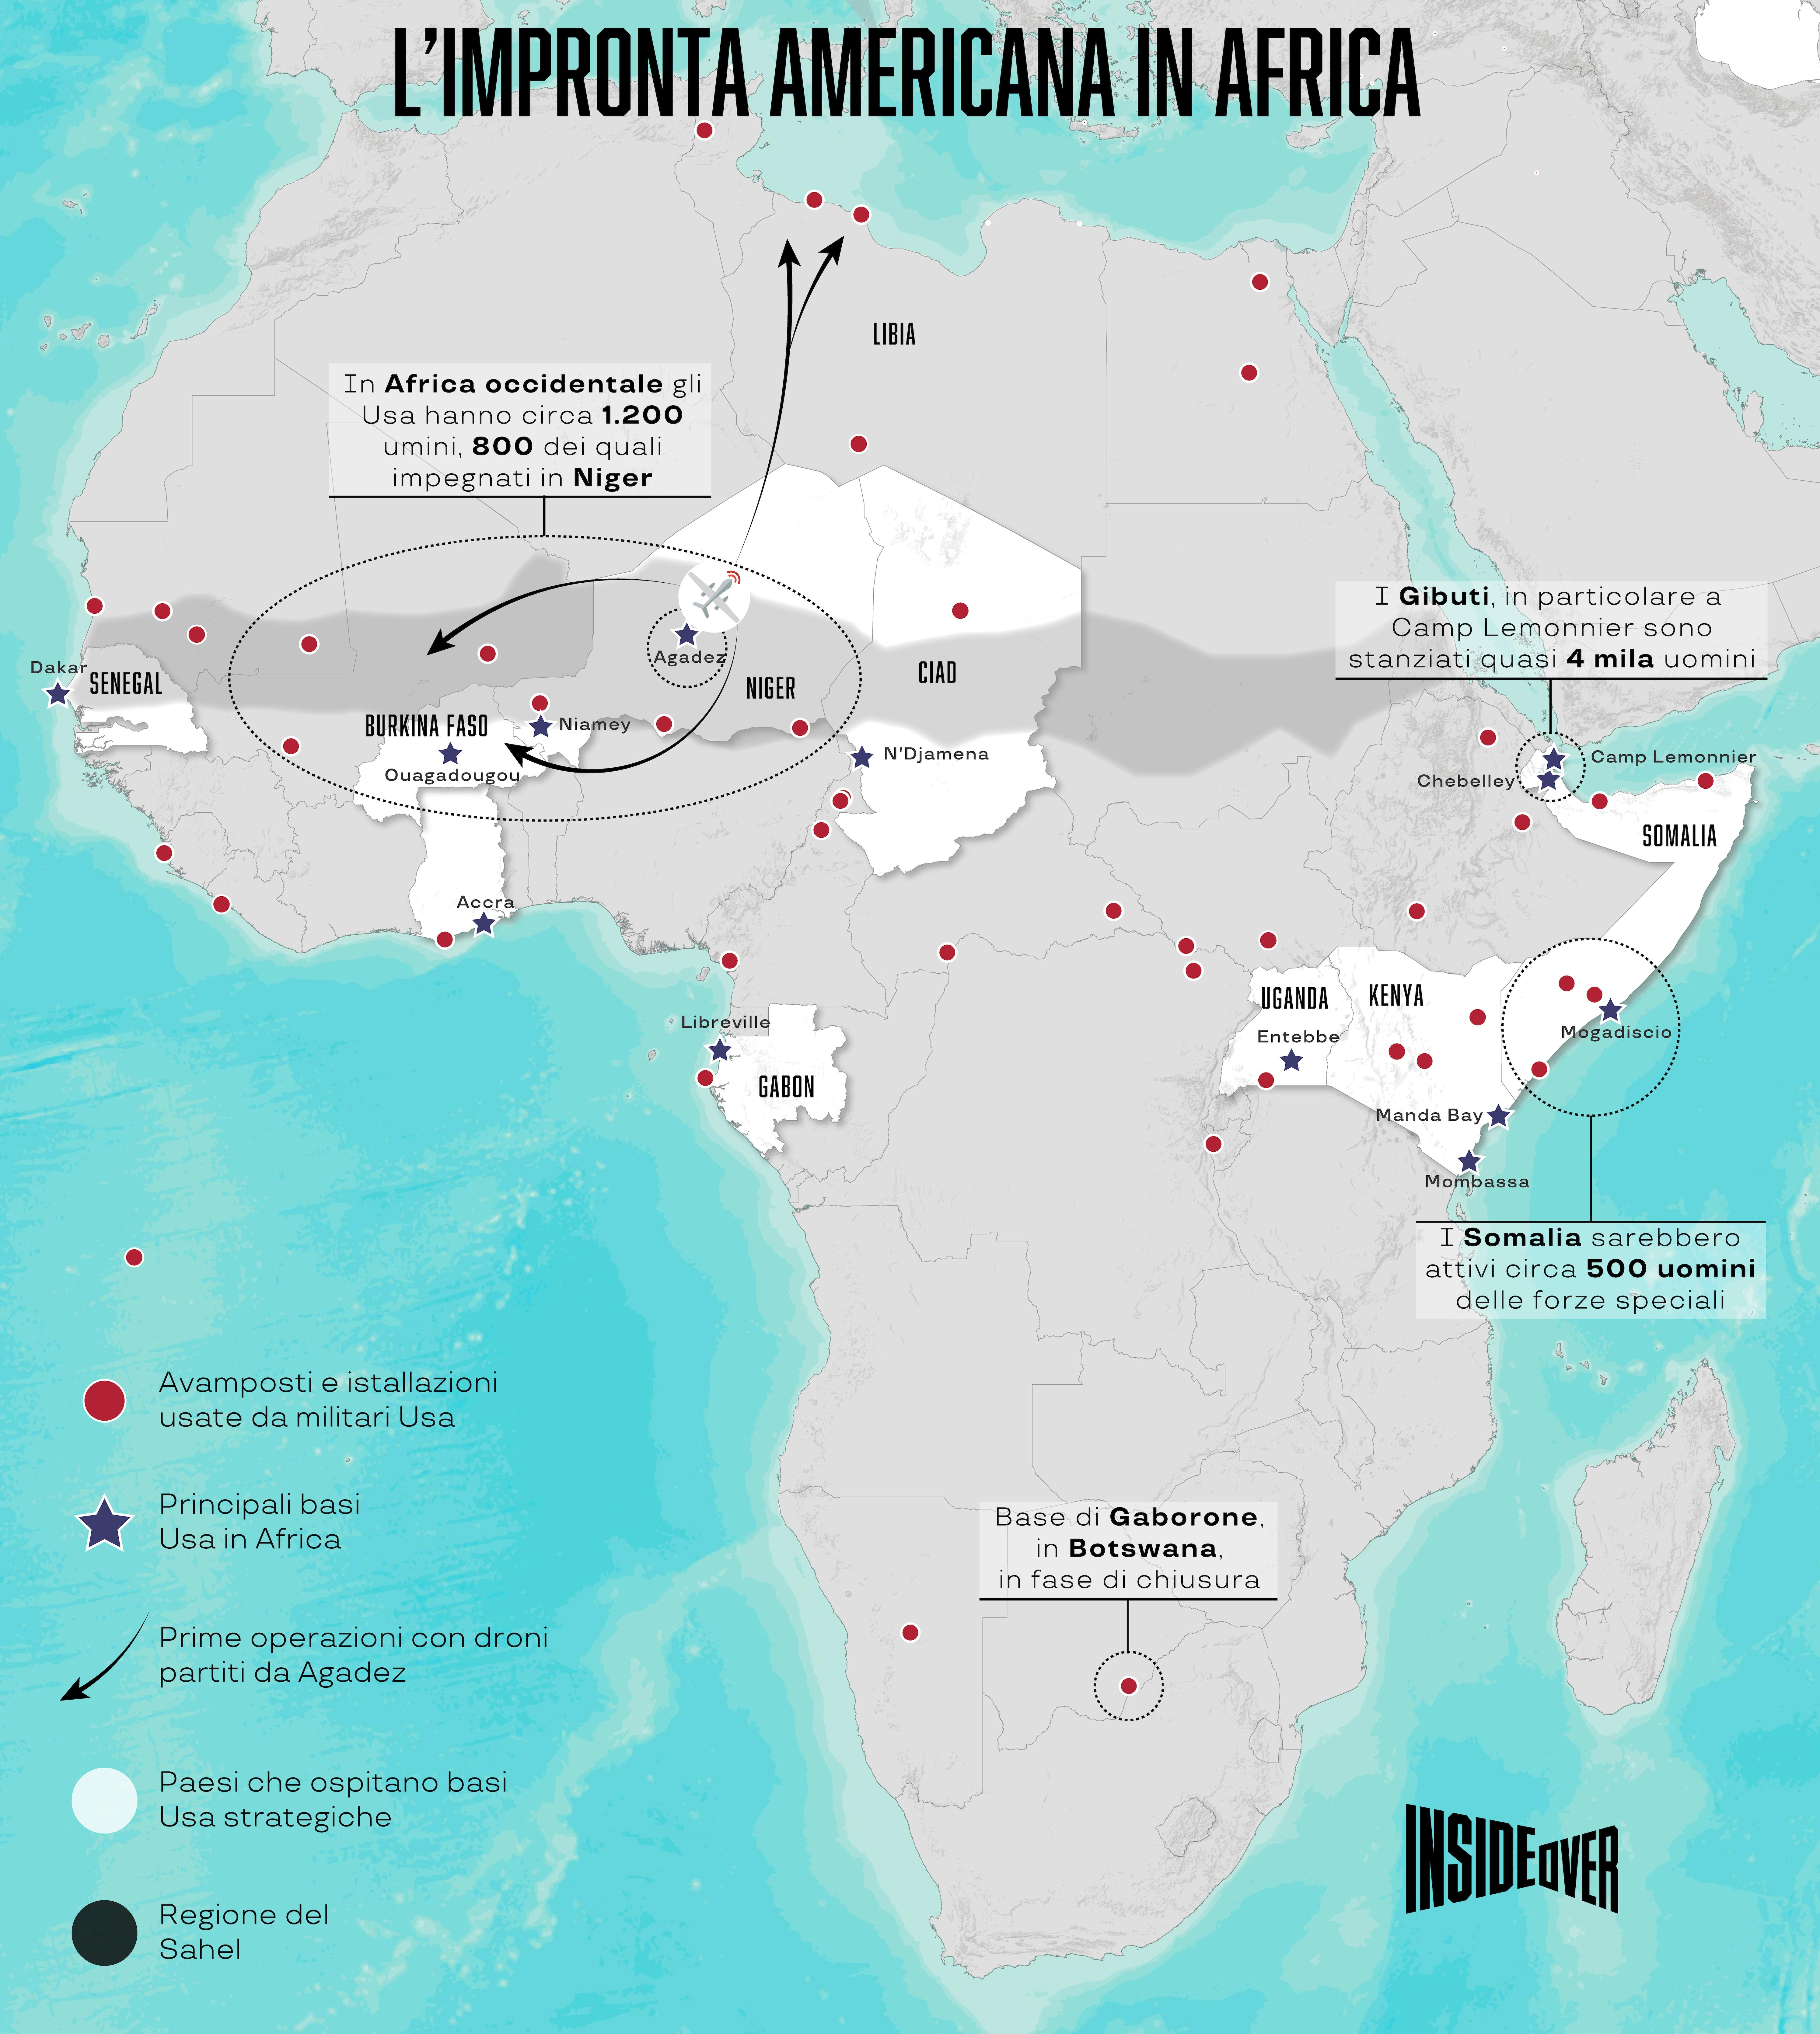 basi usa africa mappa